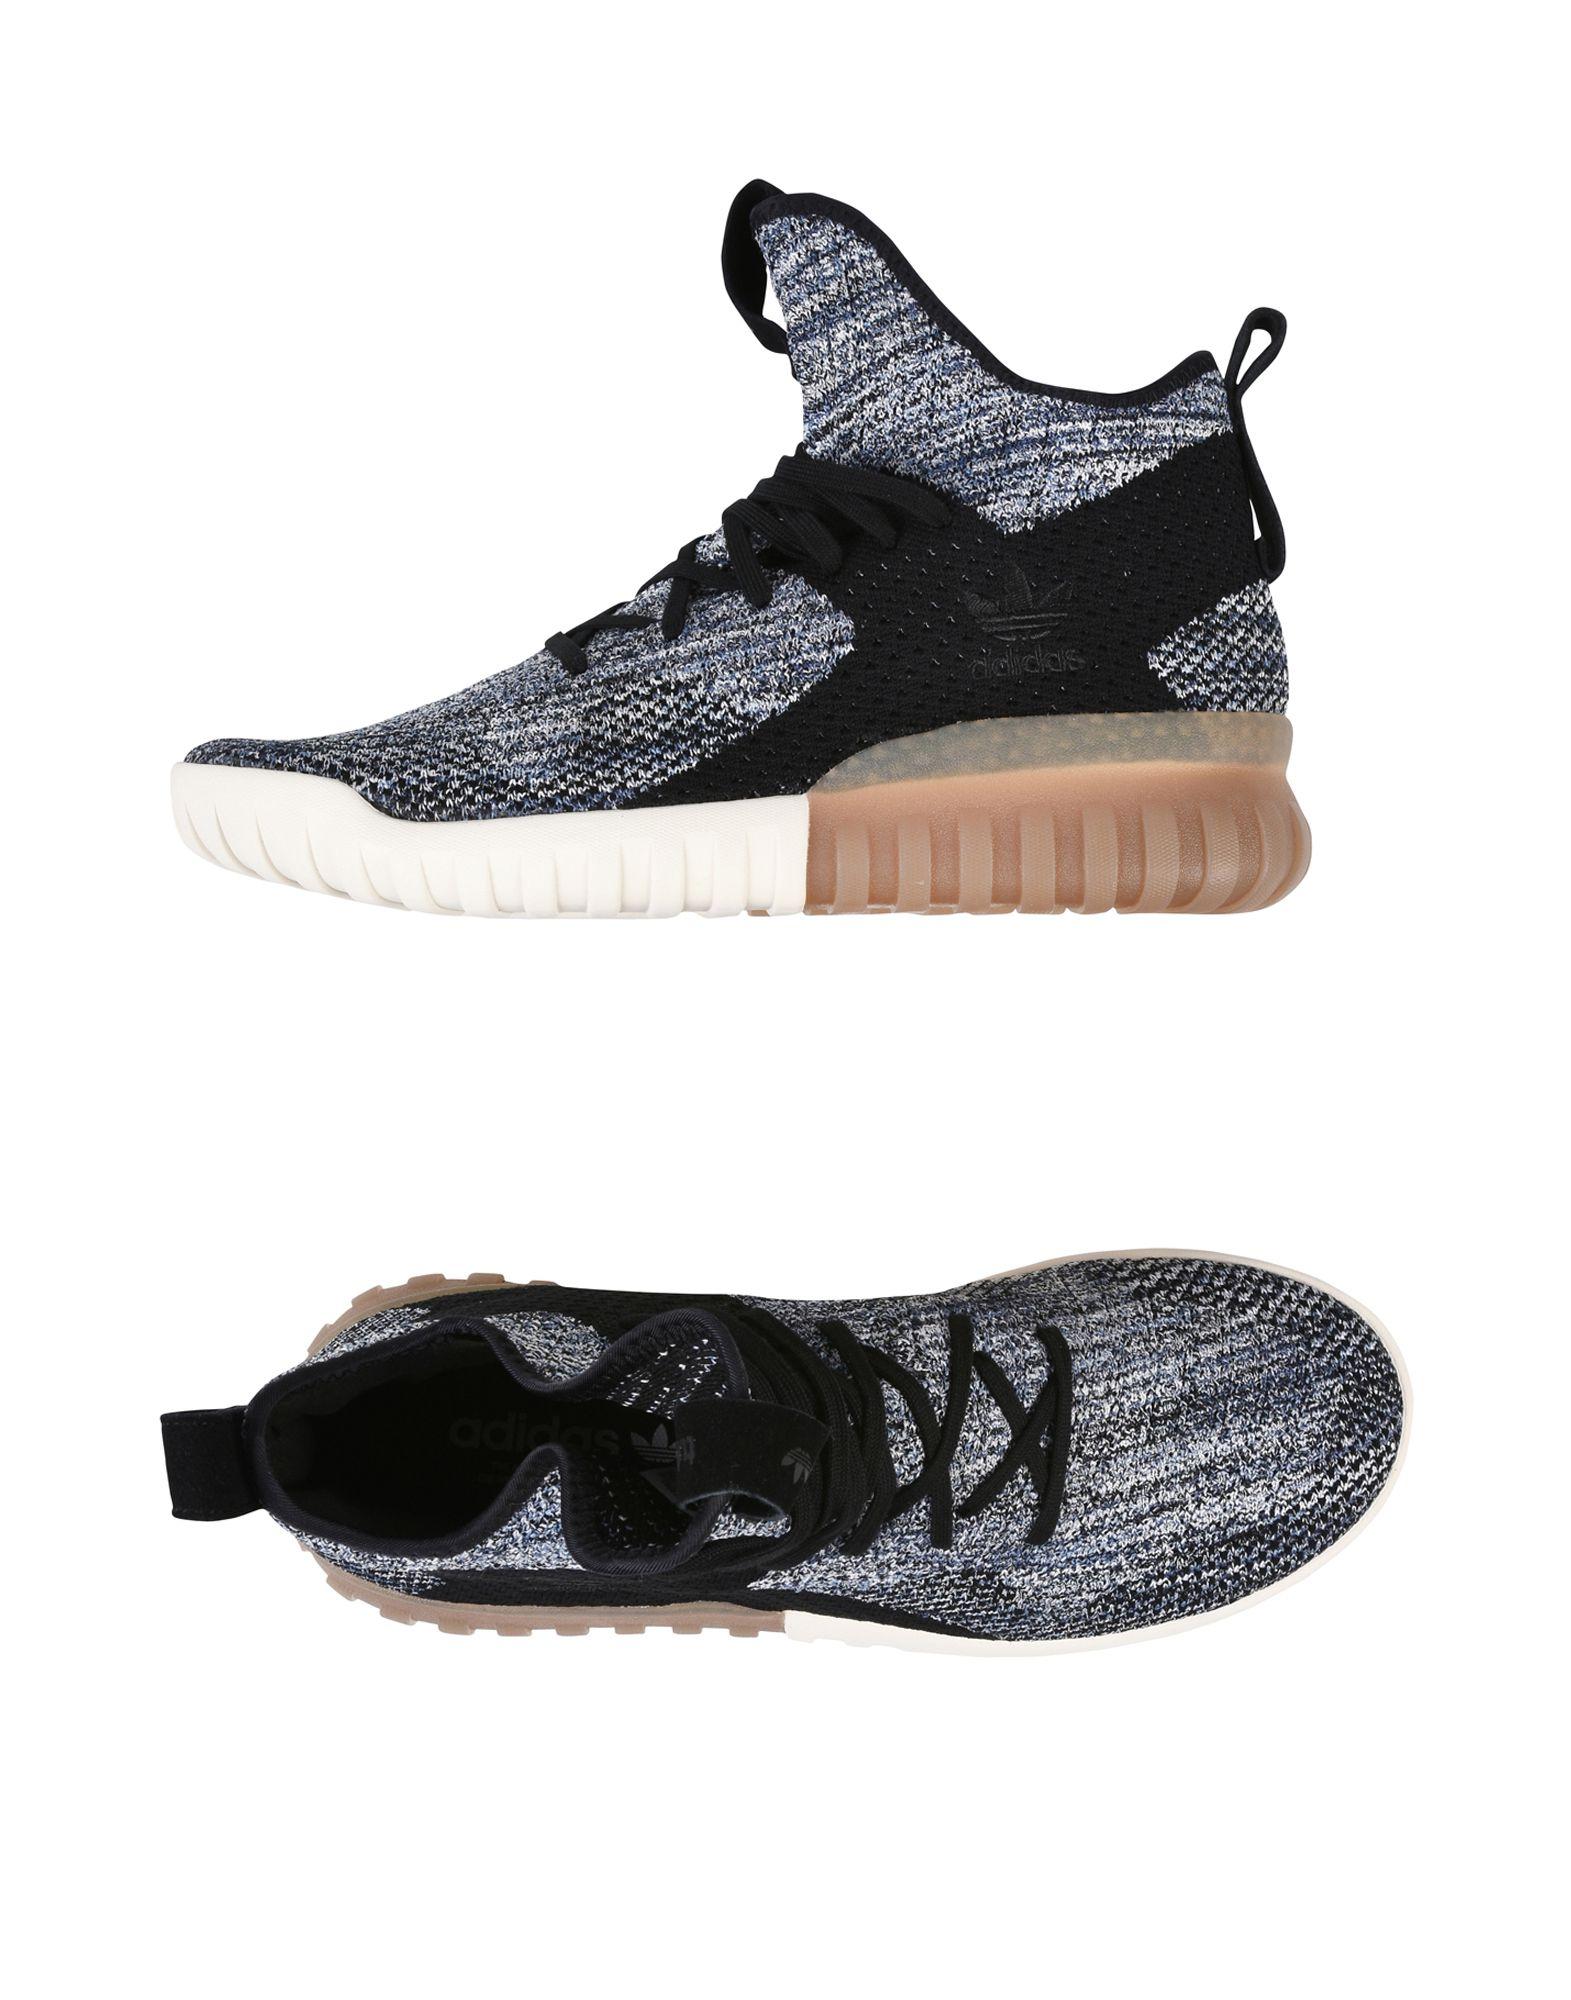 Sneakers Adidas Originals Tubular X Pk - Uomo - Acquista online su